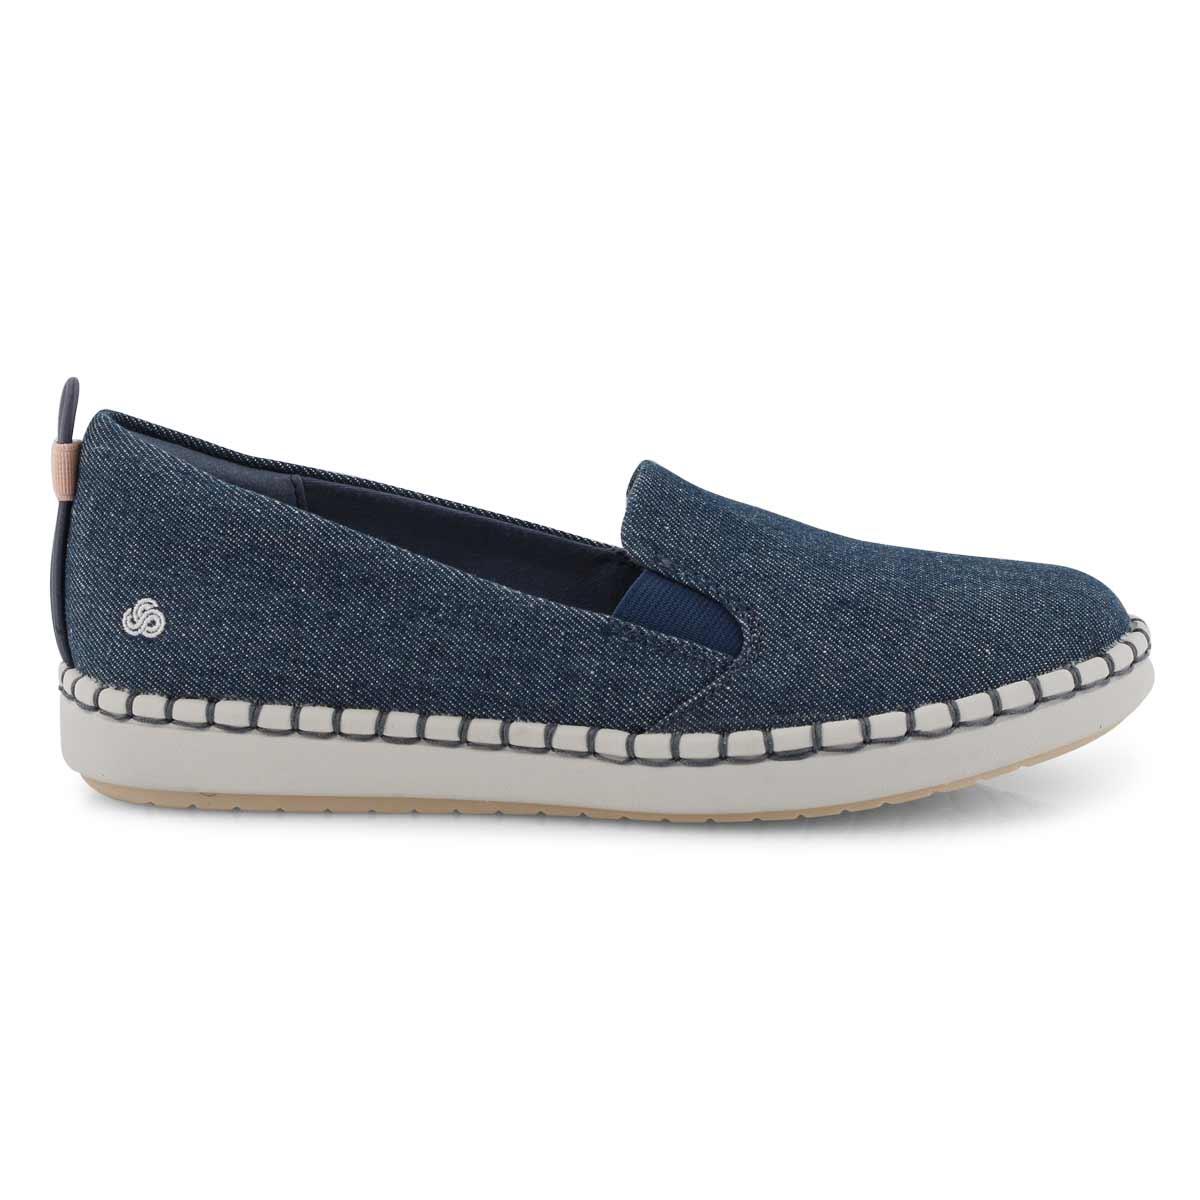 Lds Step Glow Slip denim casual loafer